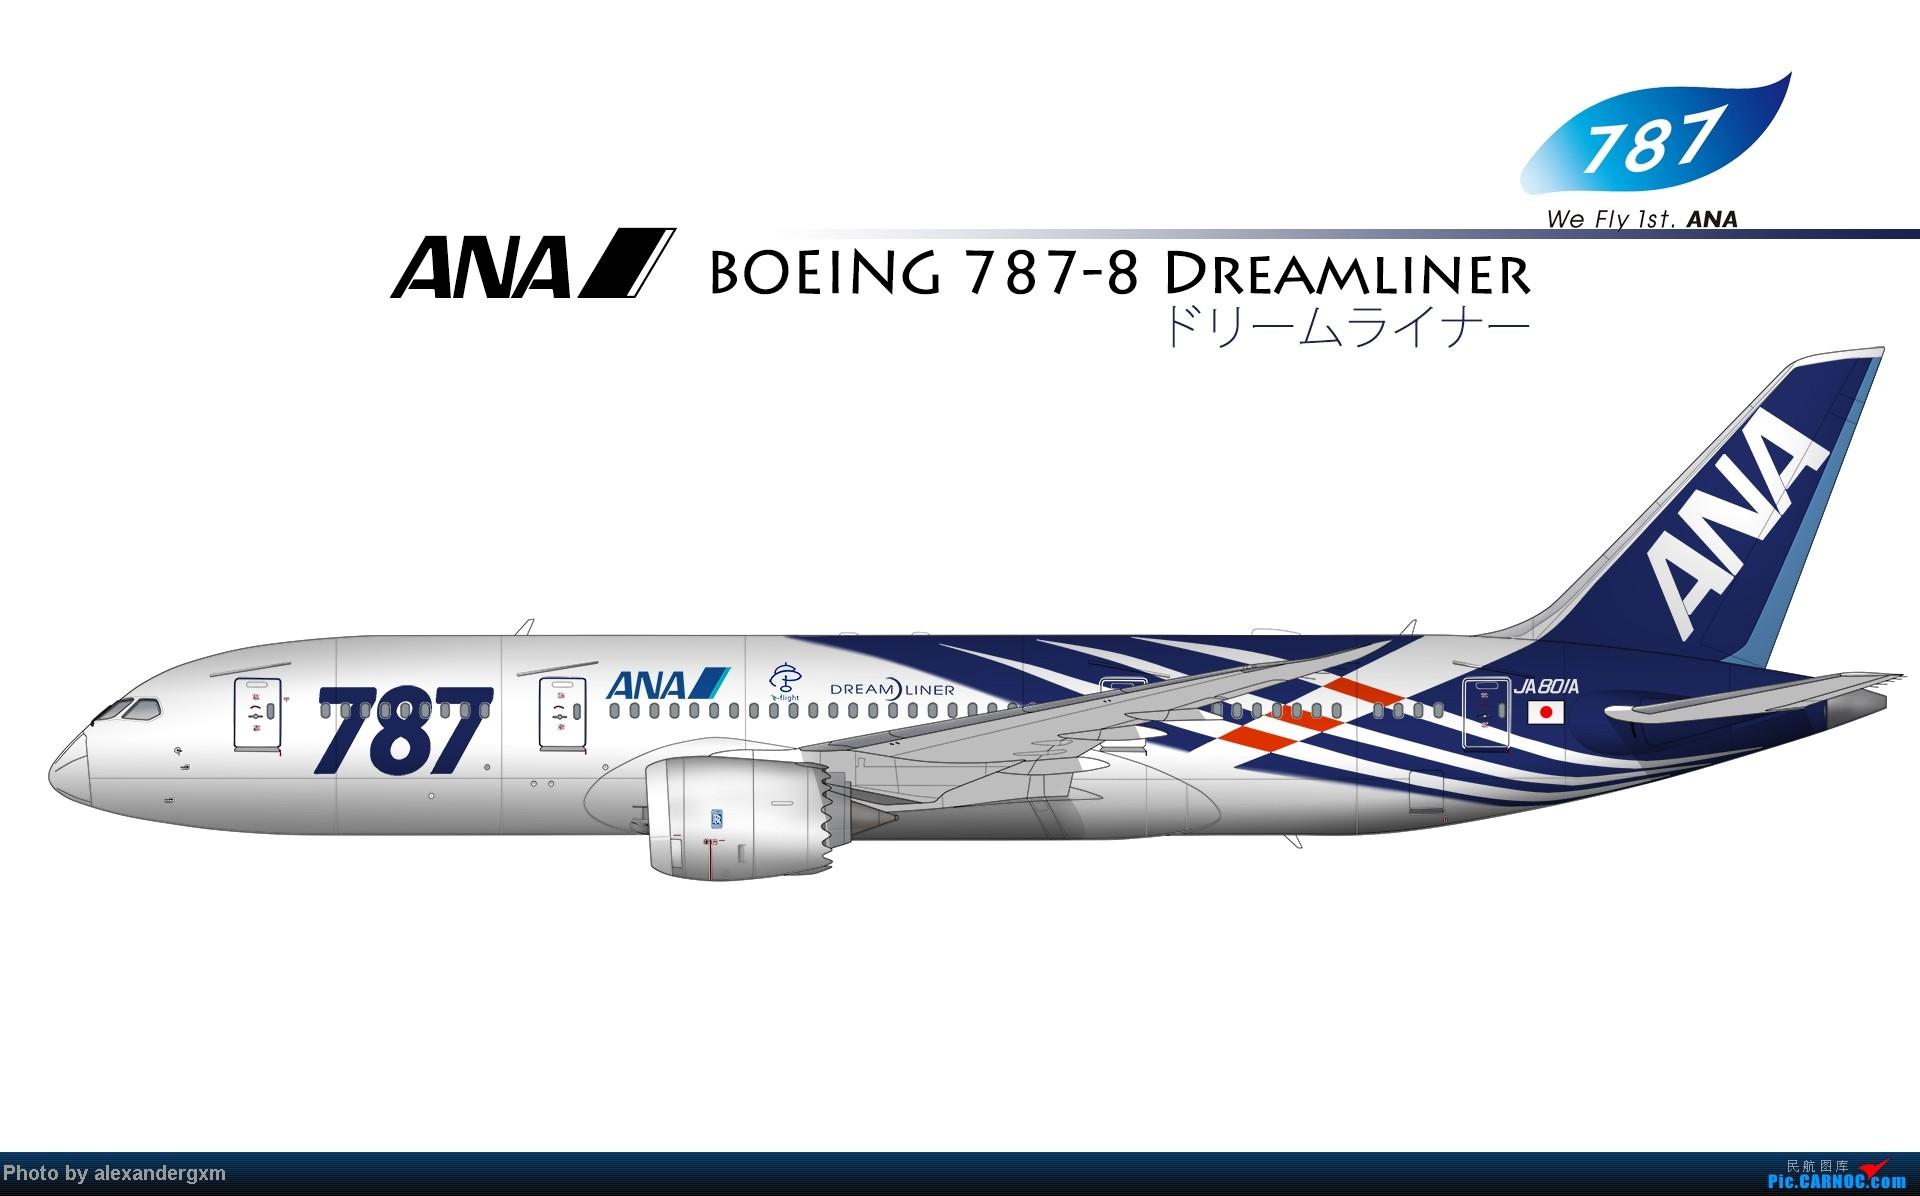 Re:[原创]发一些自己业余画的一些飞机啦~大部分侧视图~ 787